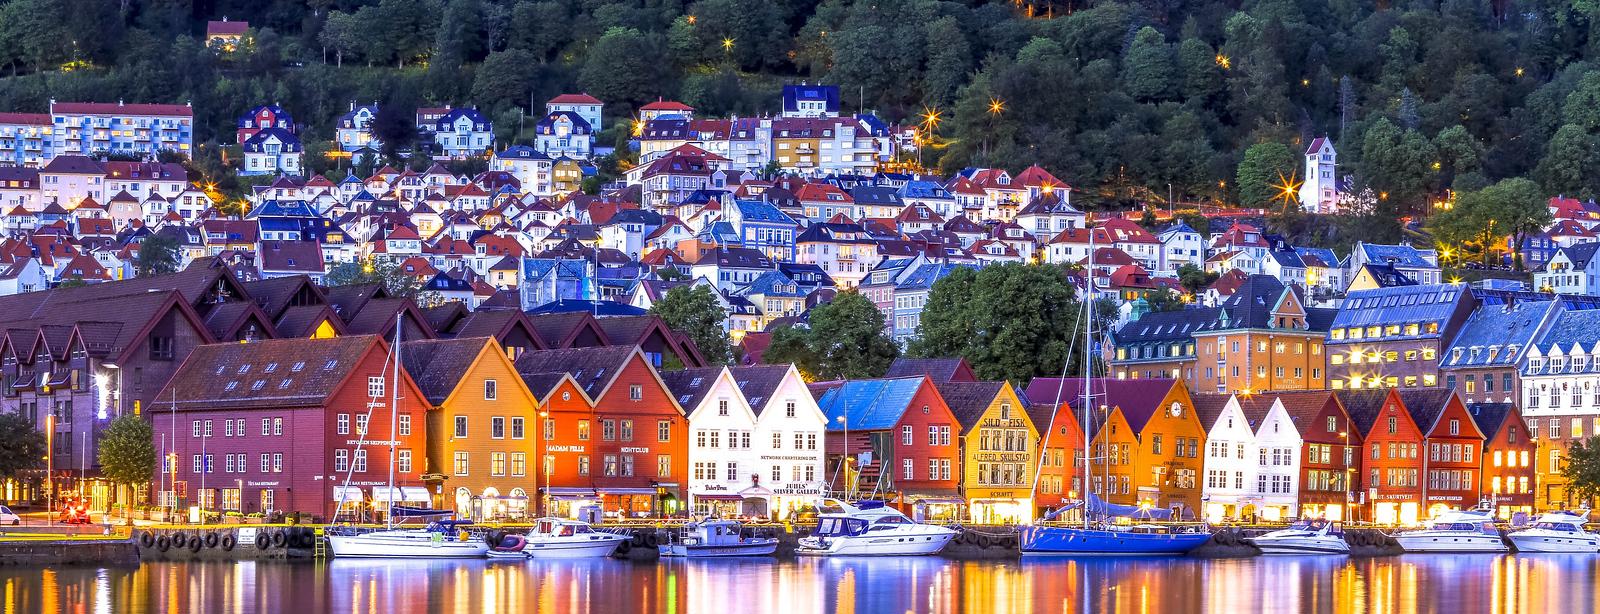 Bergen's Bryggen, oldest part of Bergen. Red building on left is our hotel.